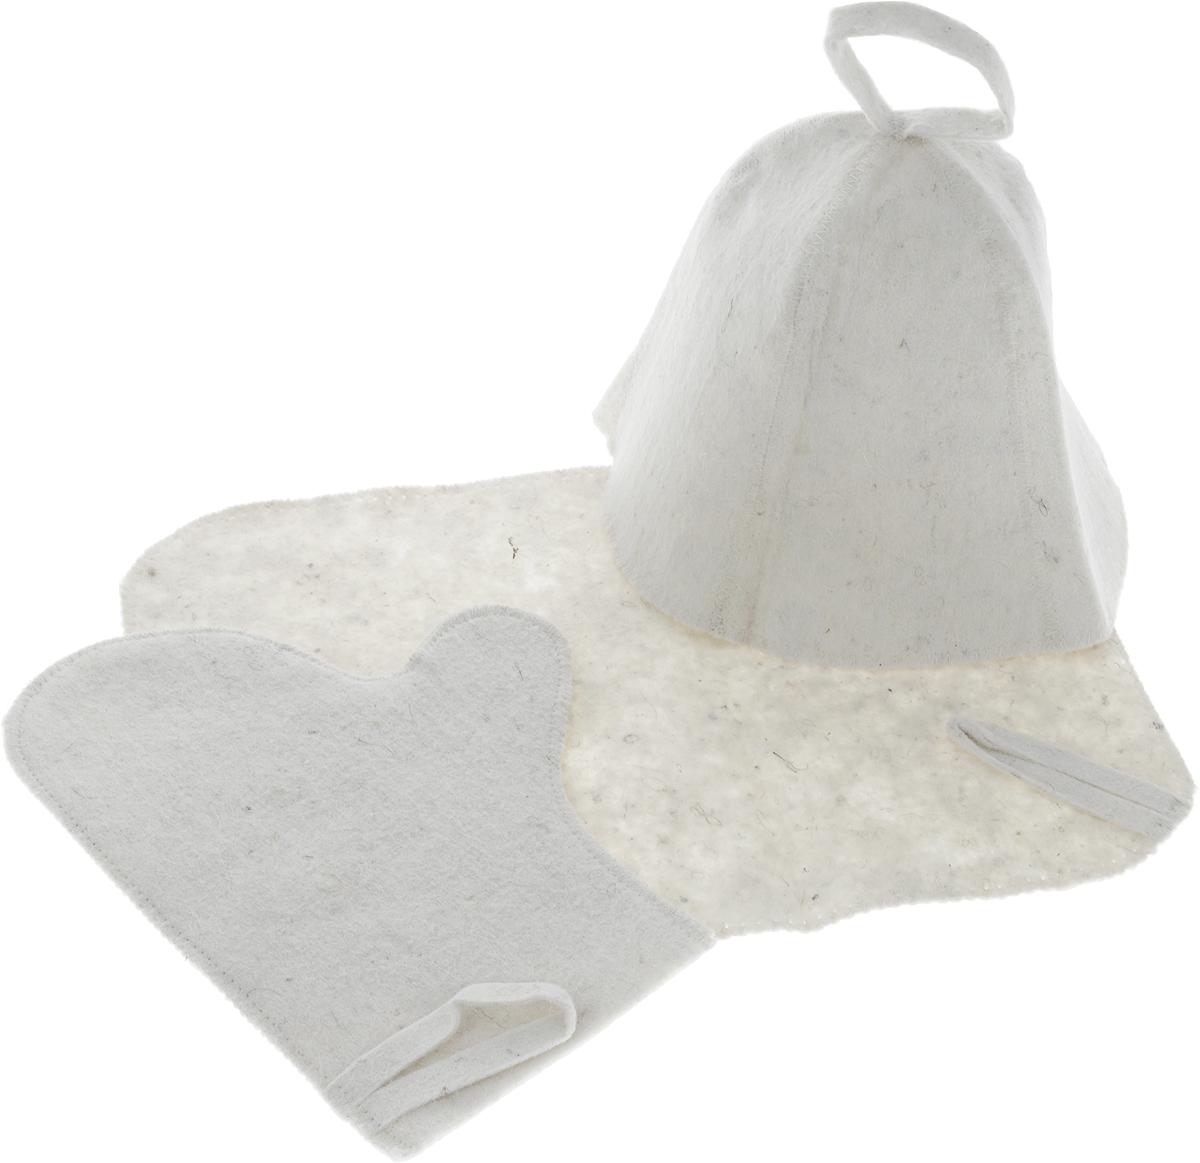 Набор для бани и сауны Proffi, 3 предмета рукавицы для бани тонтту тутто рукавица арт 142 white шт